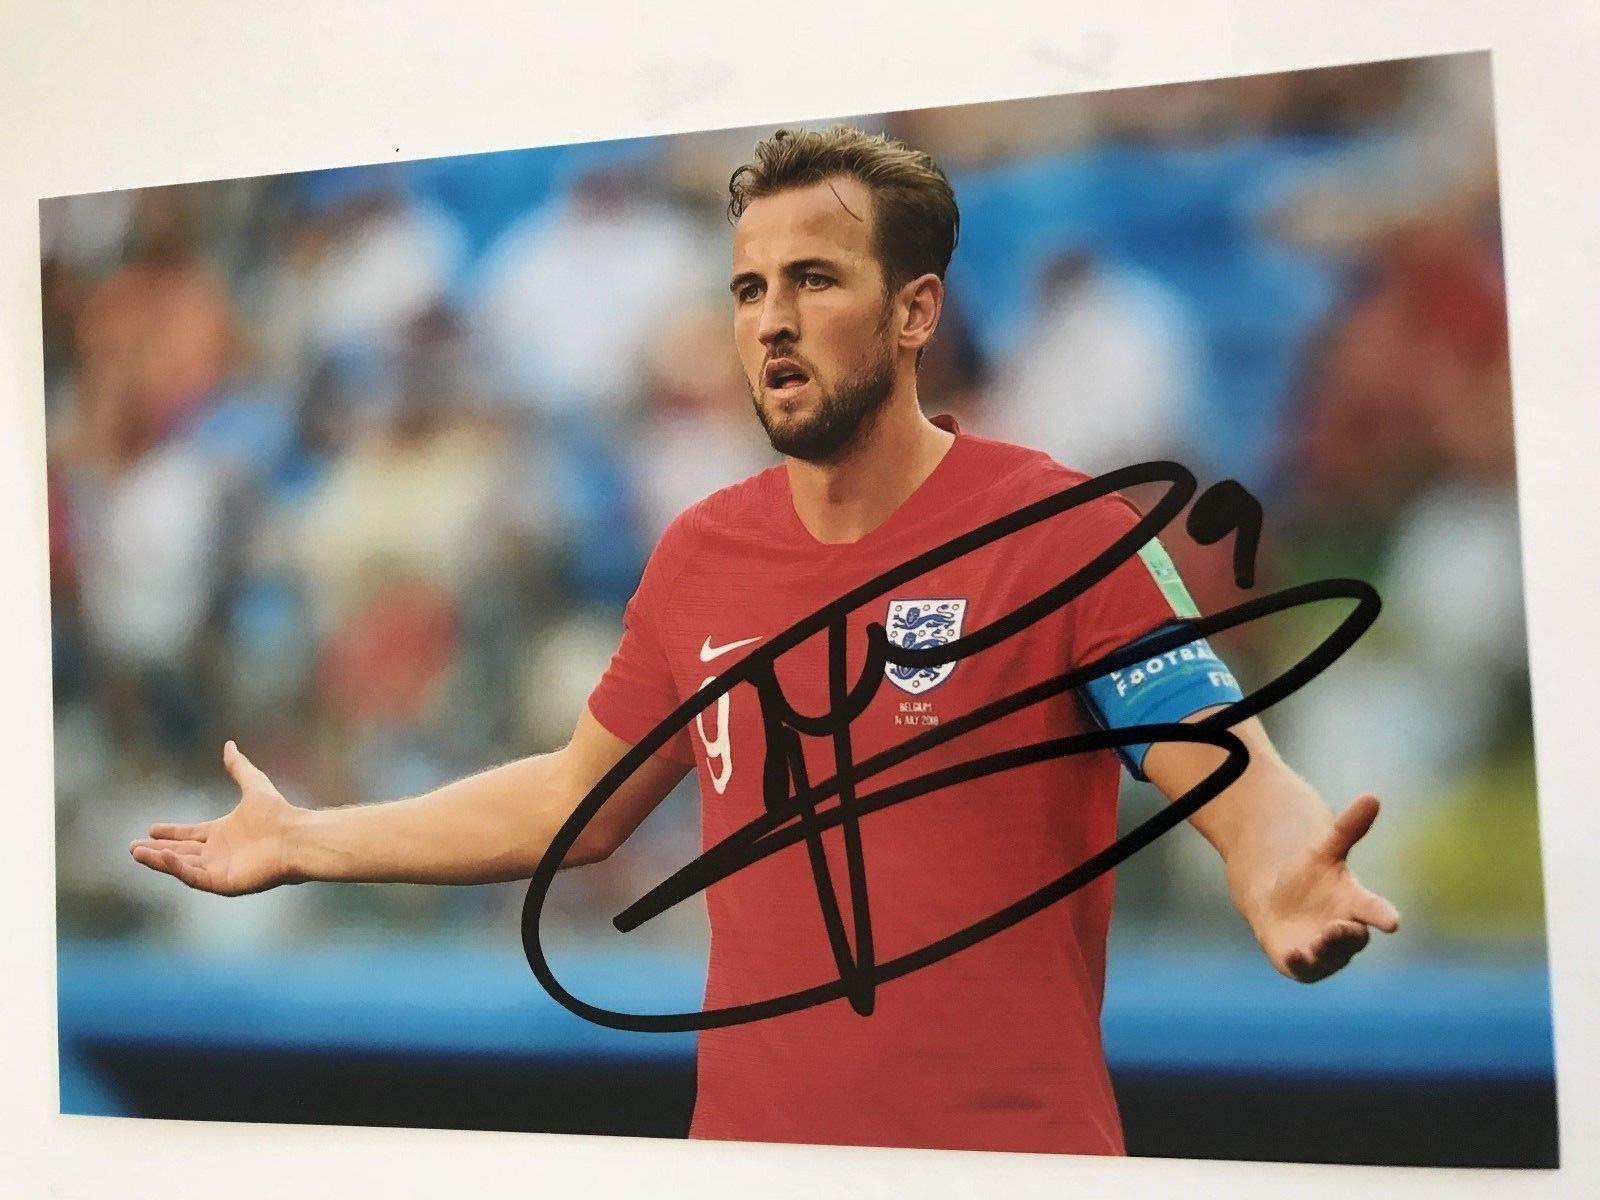 HARRY KANE Signed 6 X 4 Inch Soccer Photograph. Genuine Autograph. COA! Free Frame!